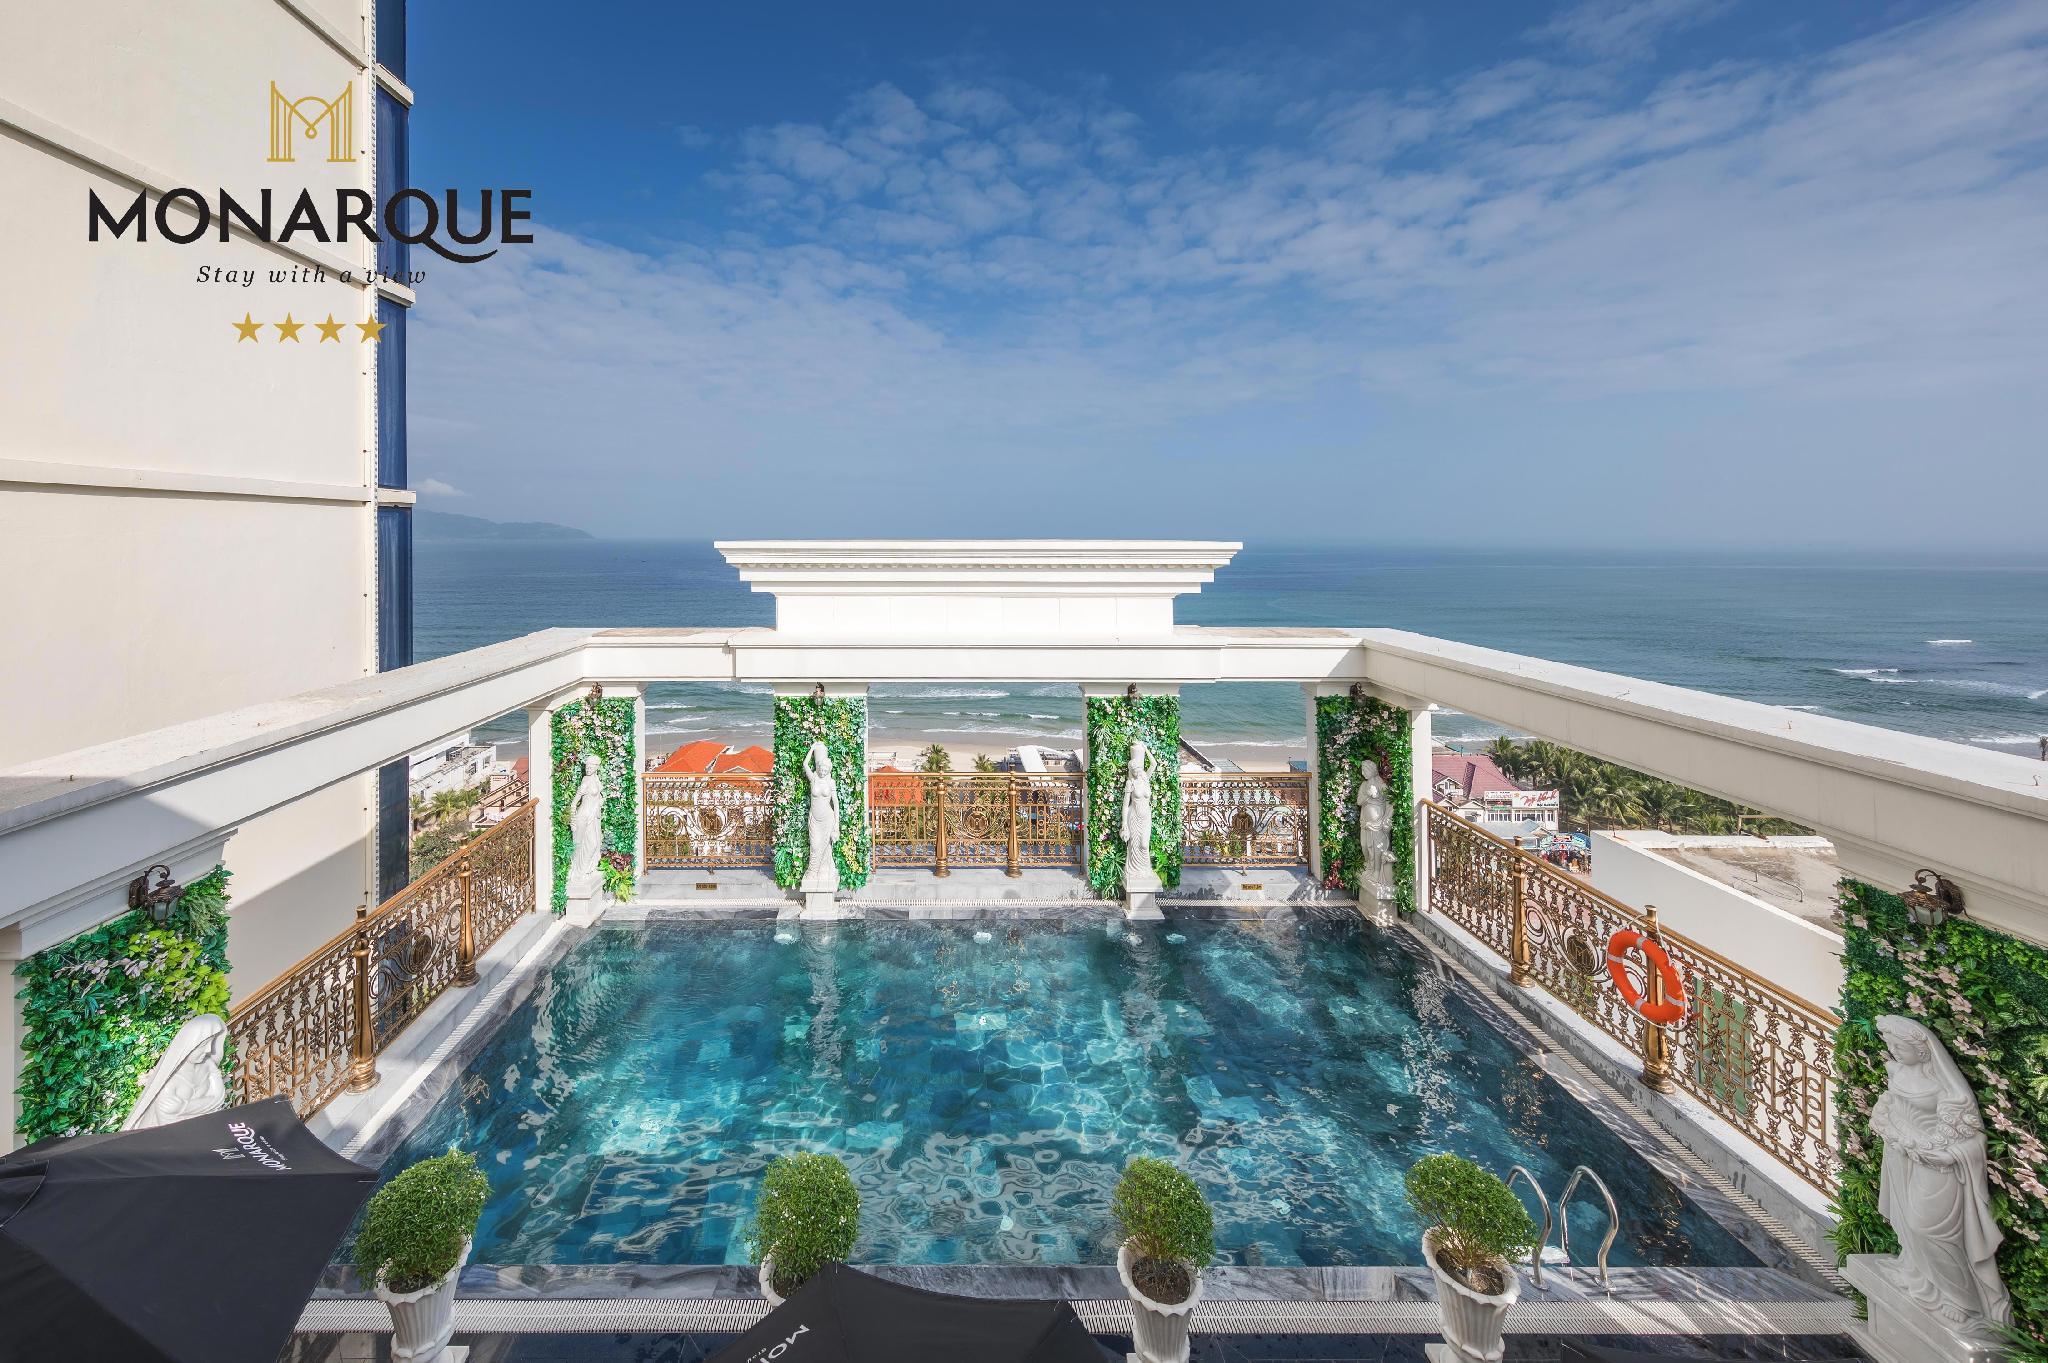 Monarque Hotel Danang